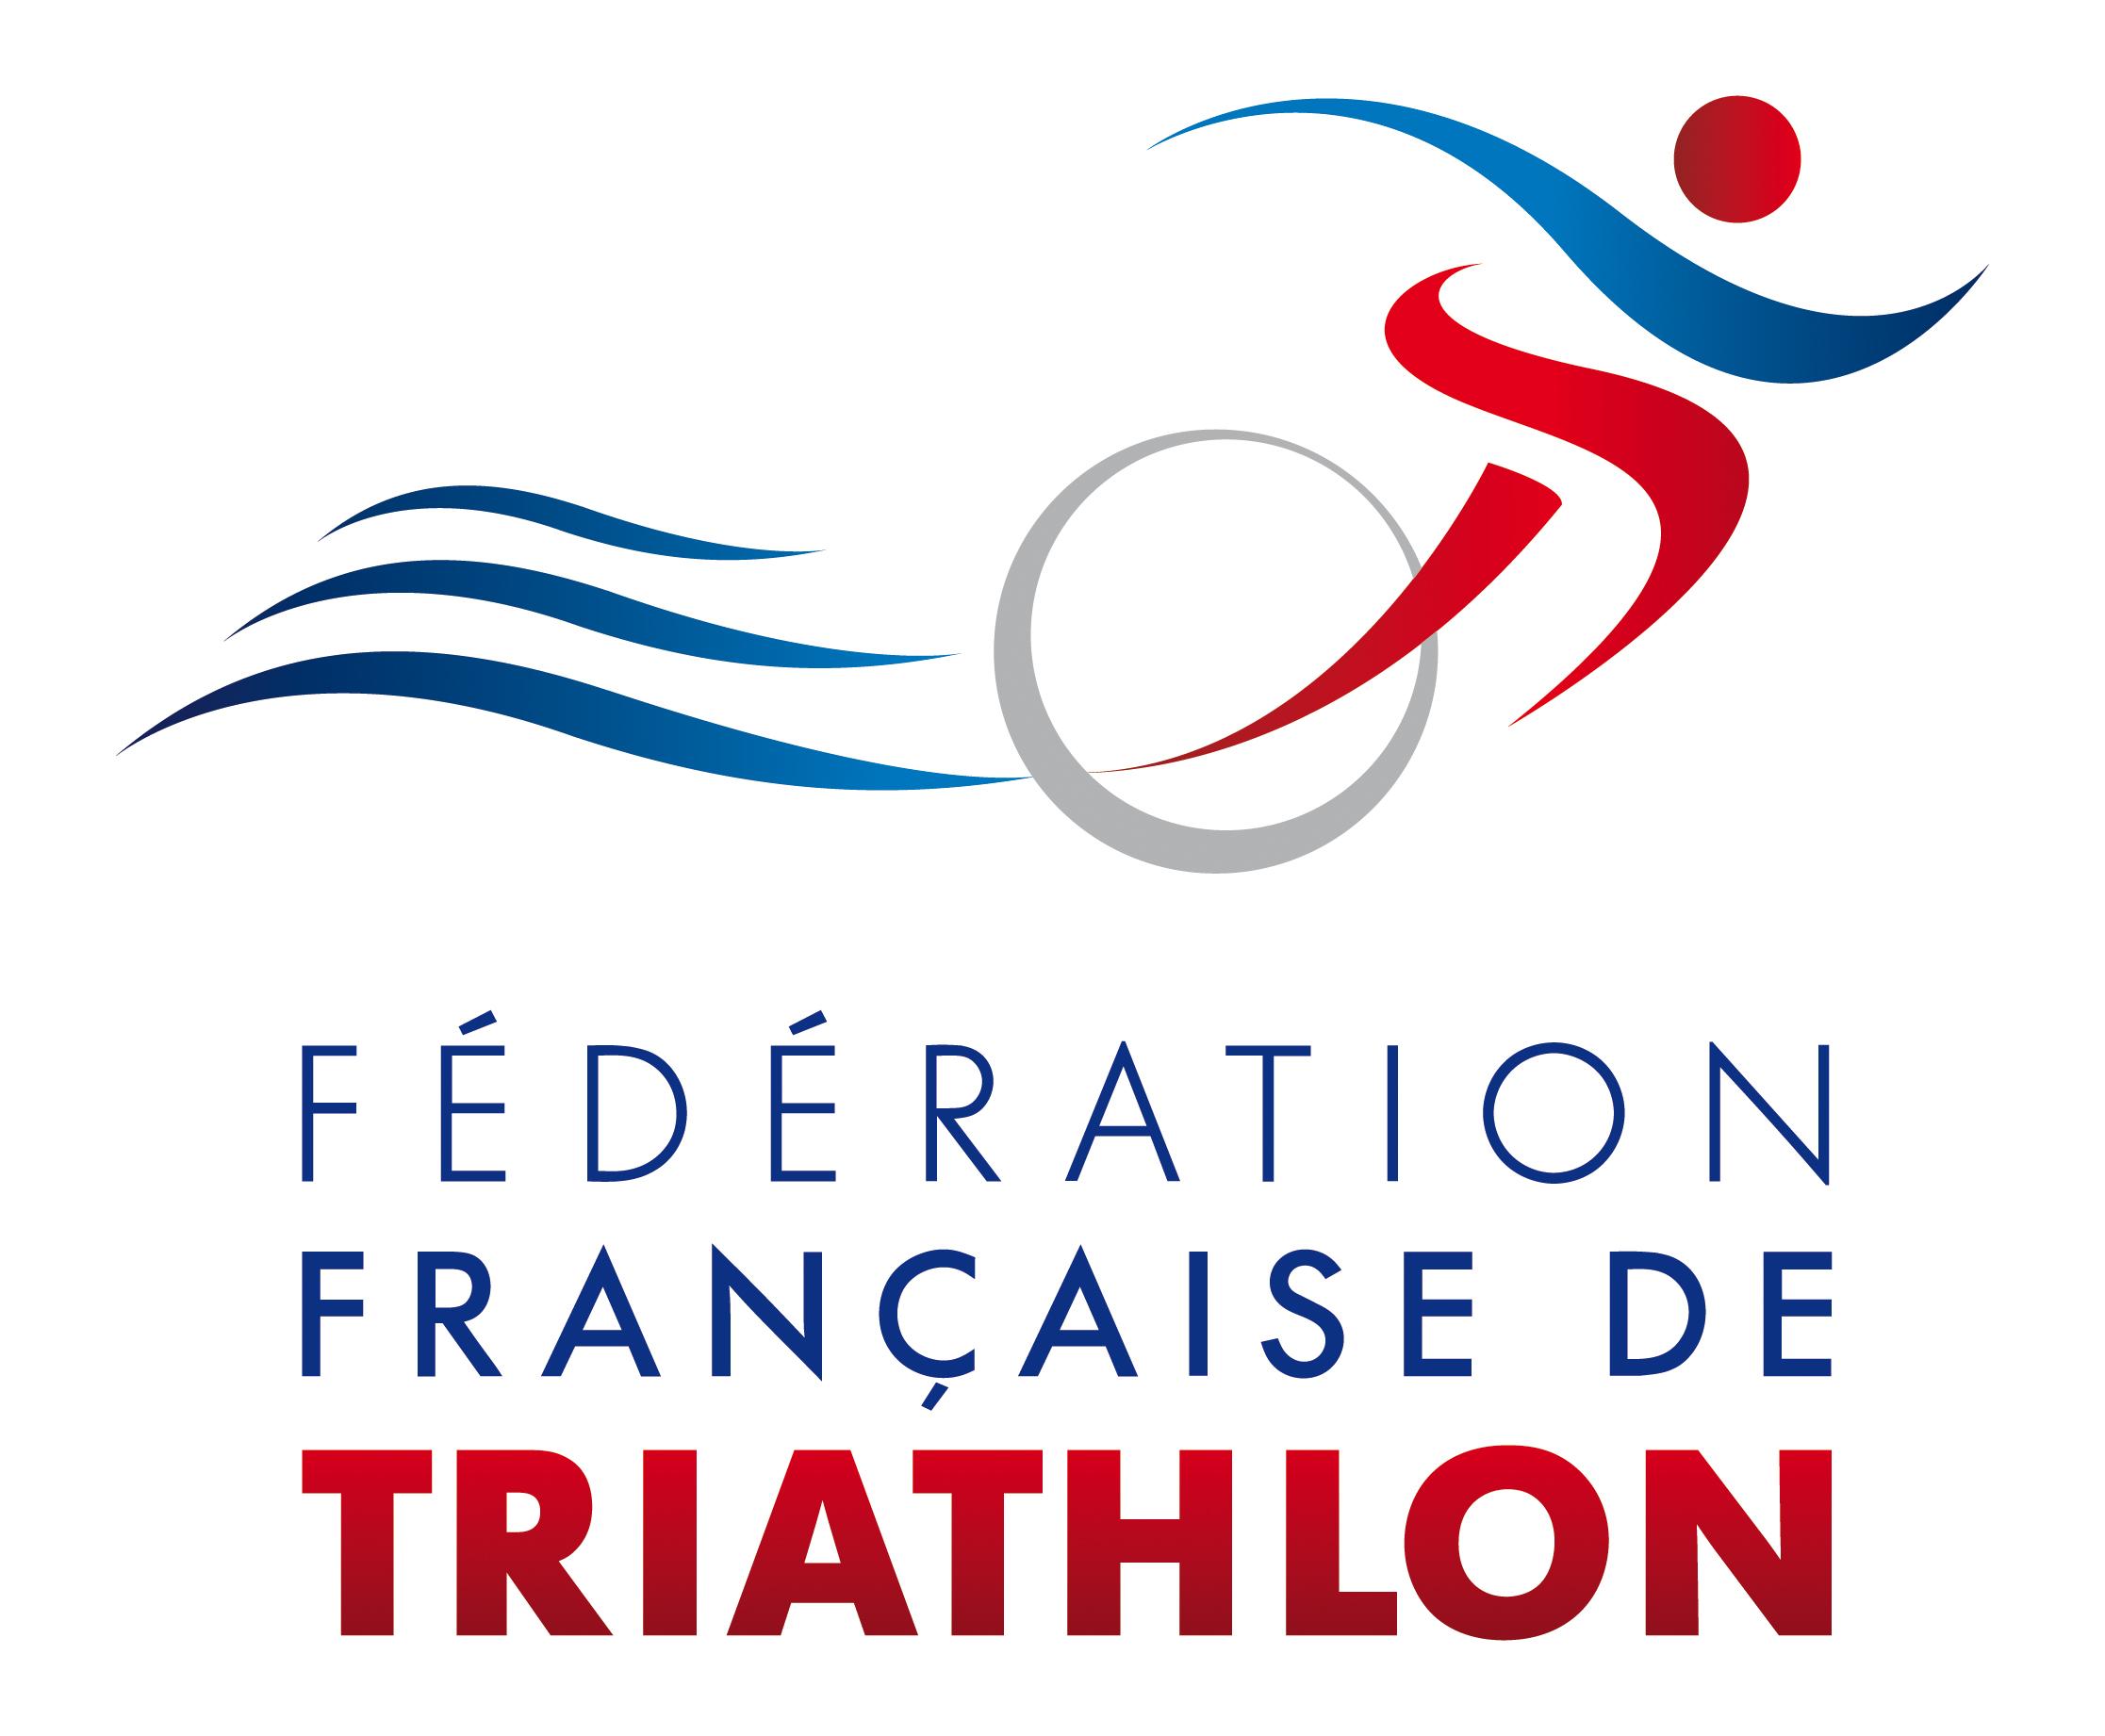 Federation Francaise de Triathlon logo